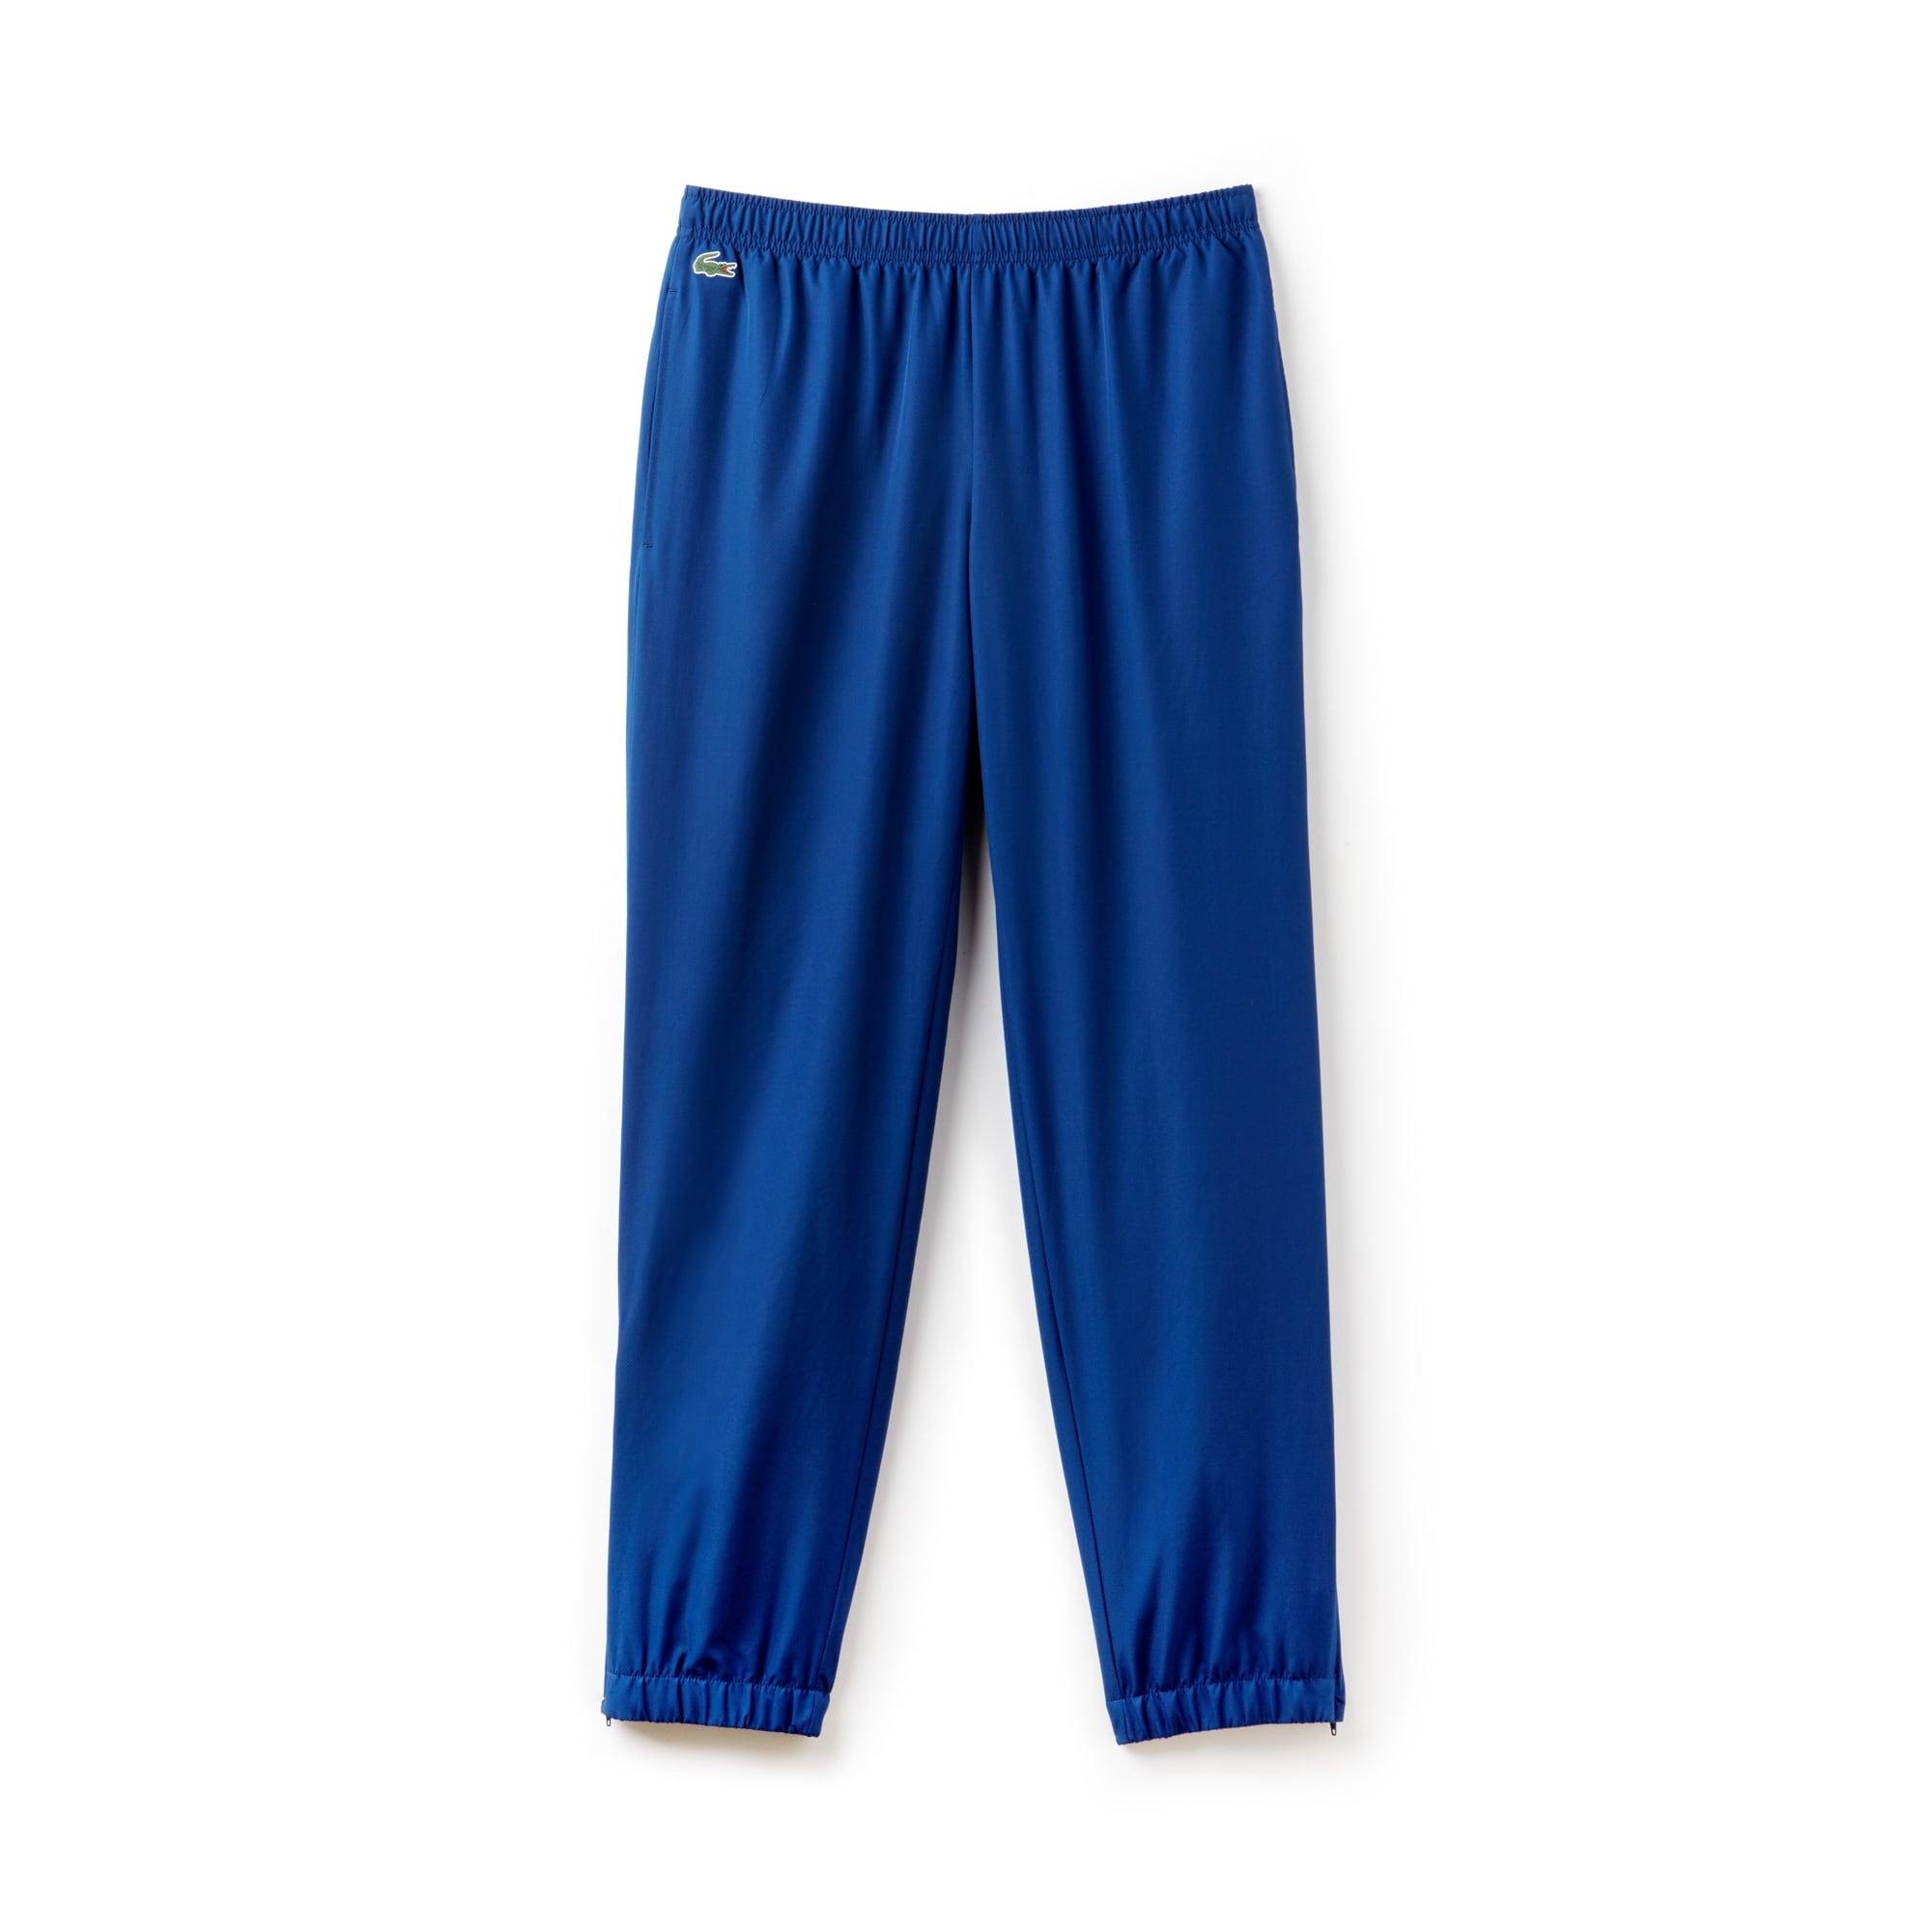 Men's SPORT Taffeta Tennis Sweatpants